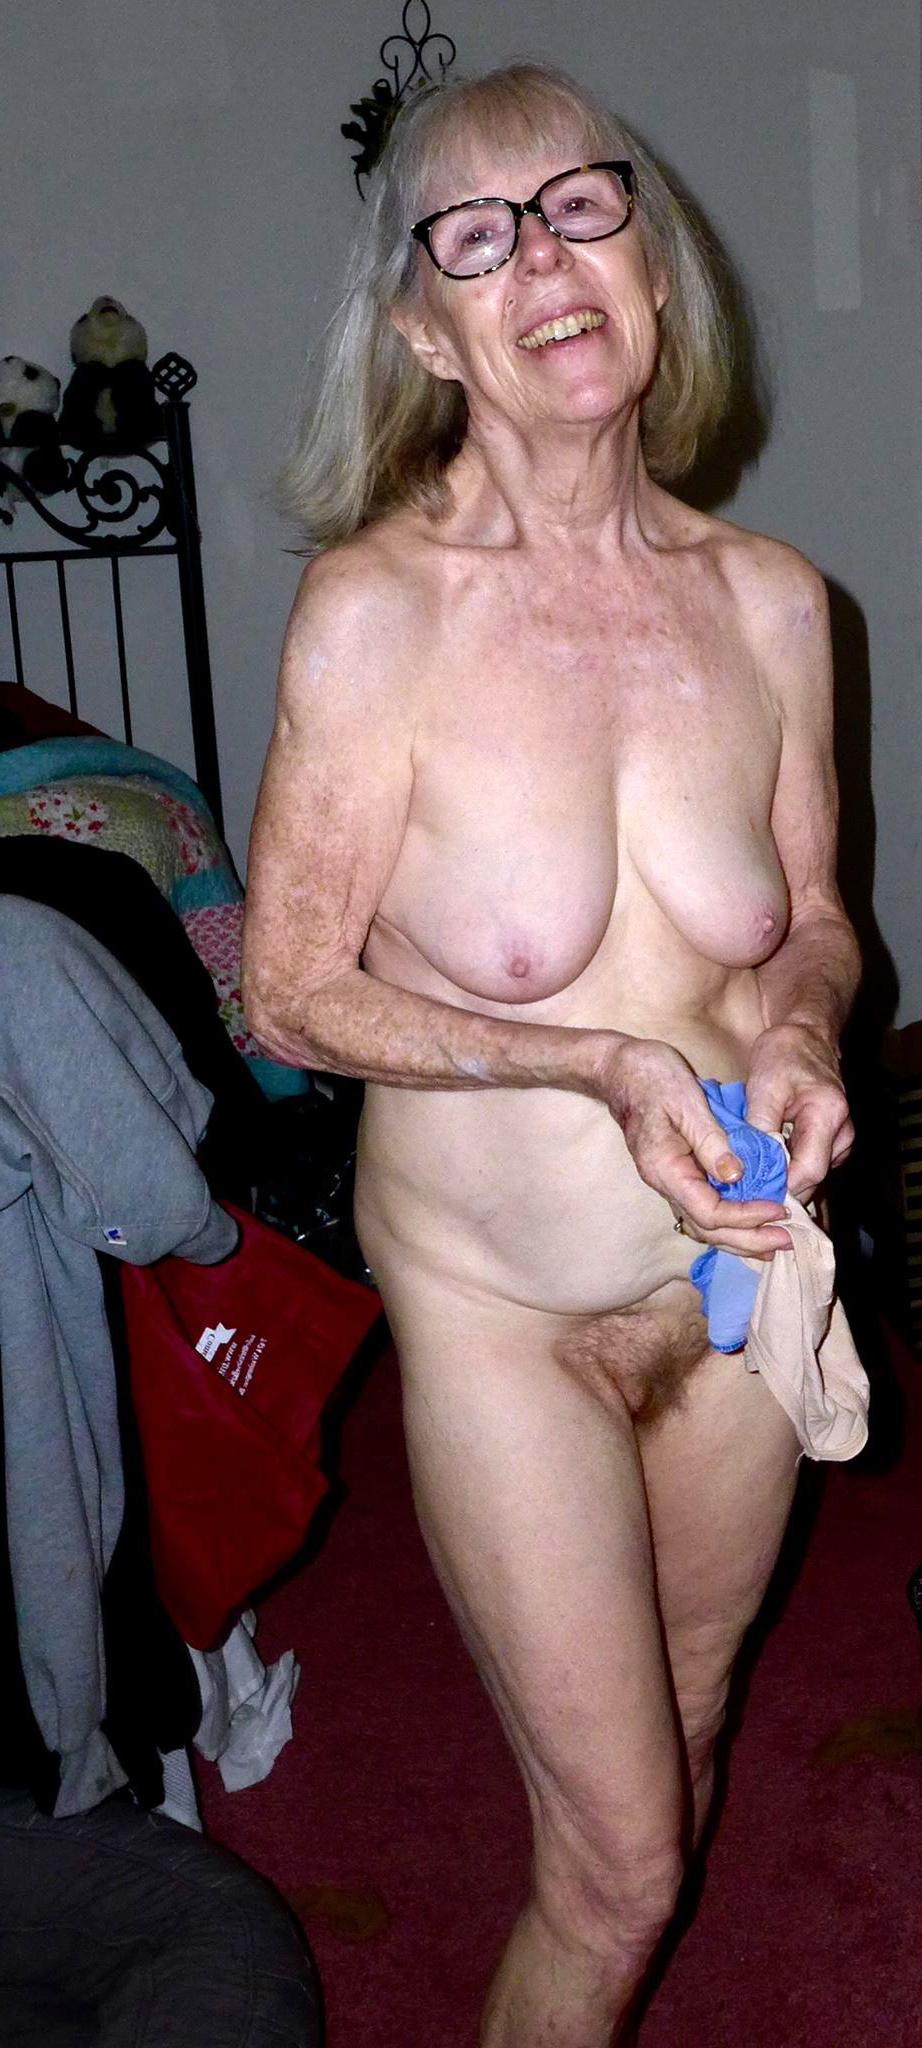 60 Year Old Women Nude